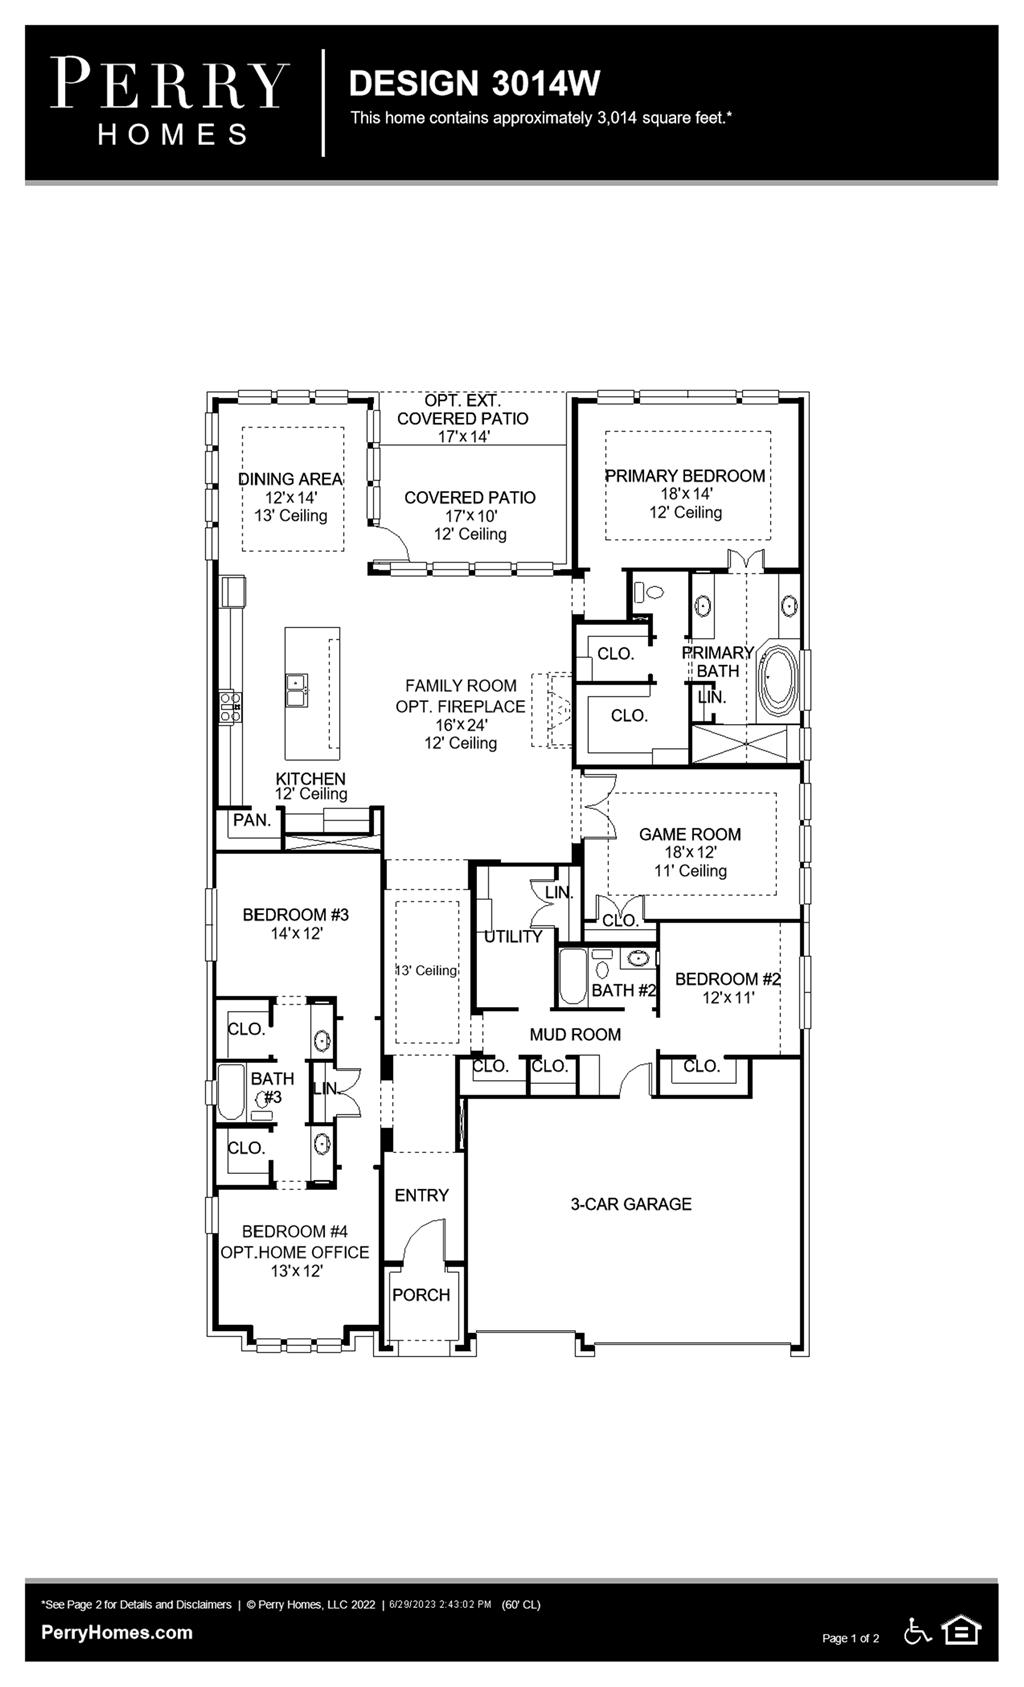 Floor Plan for 3014W